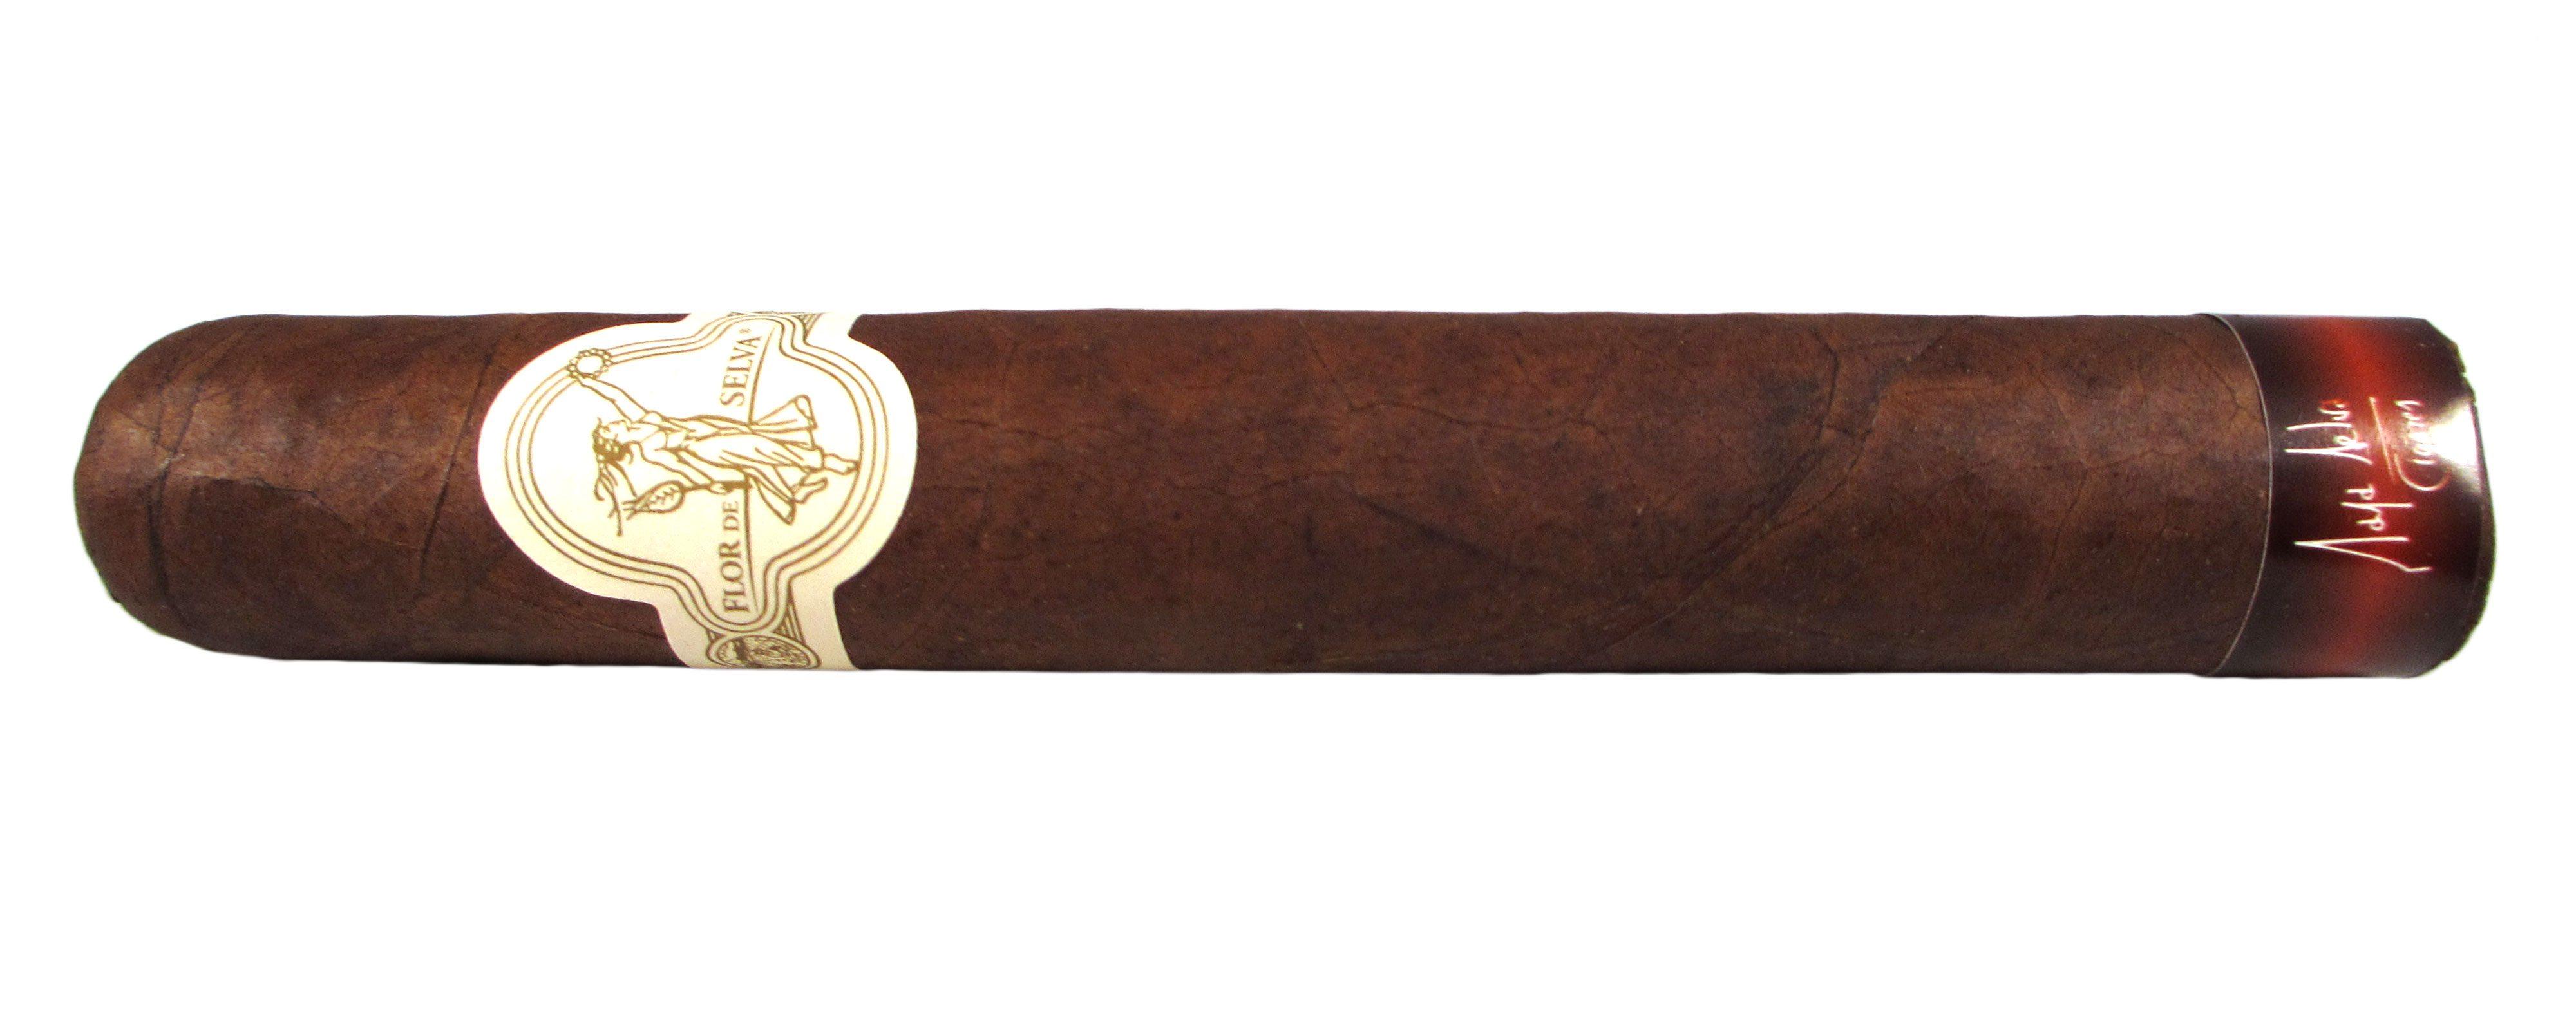 Blind Cigar Review: Maya Selva | Flor de Selva Maduro Tempo